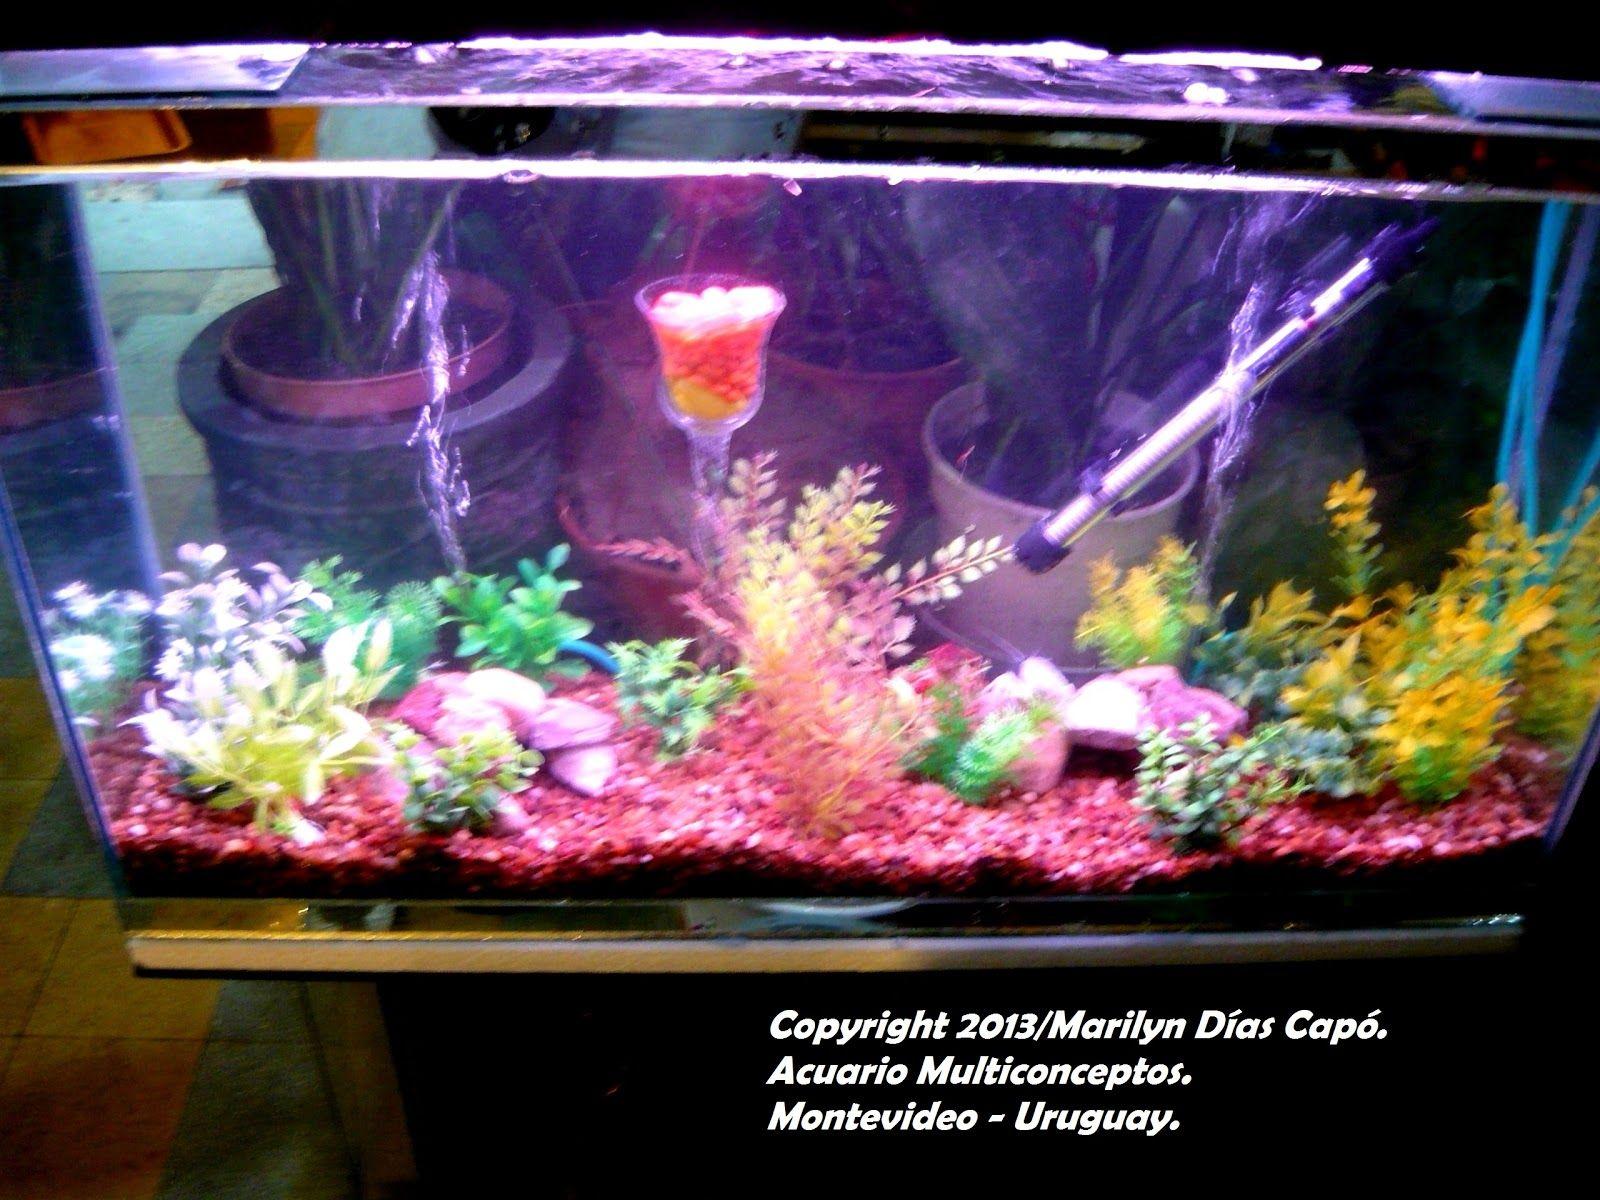 Peces tropicales de agua dulce mi primer acuario c mo for Comida para peces tropicales acuario